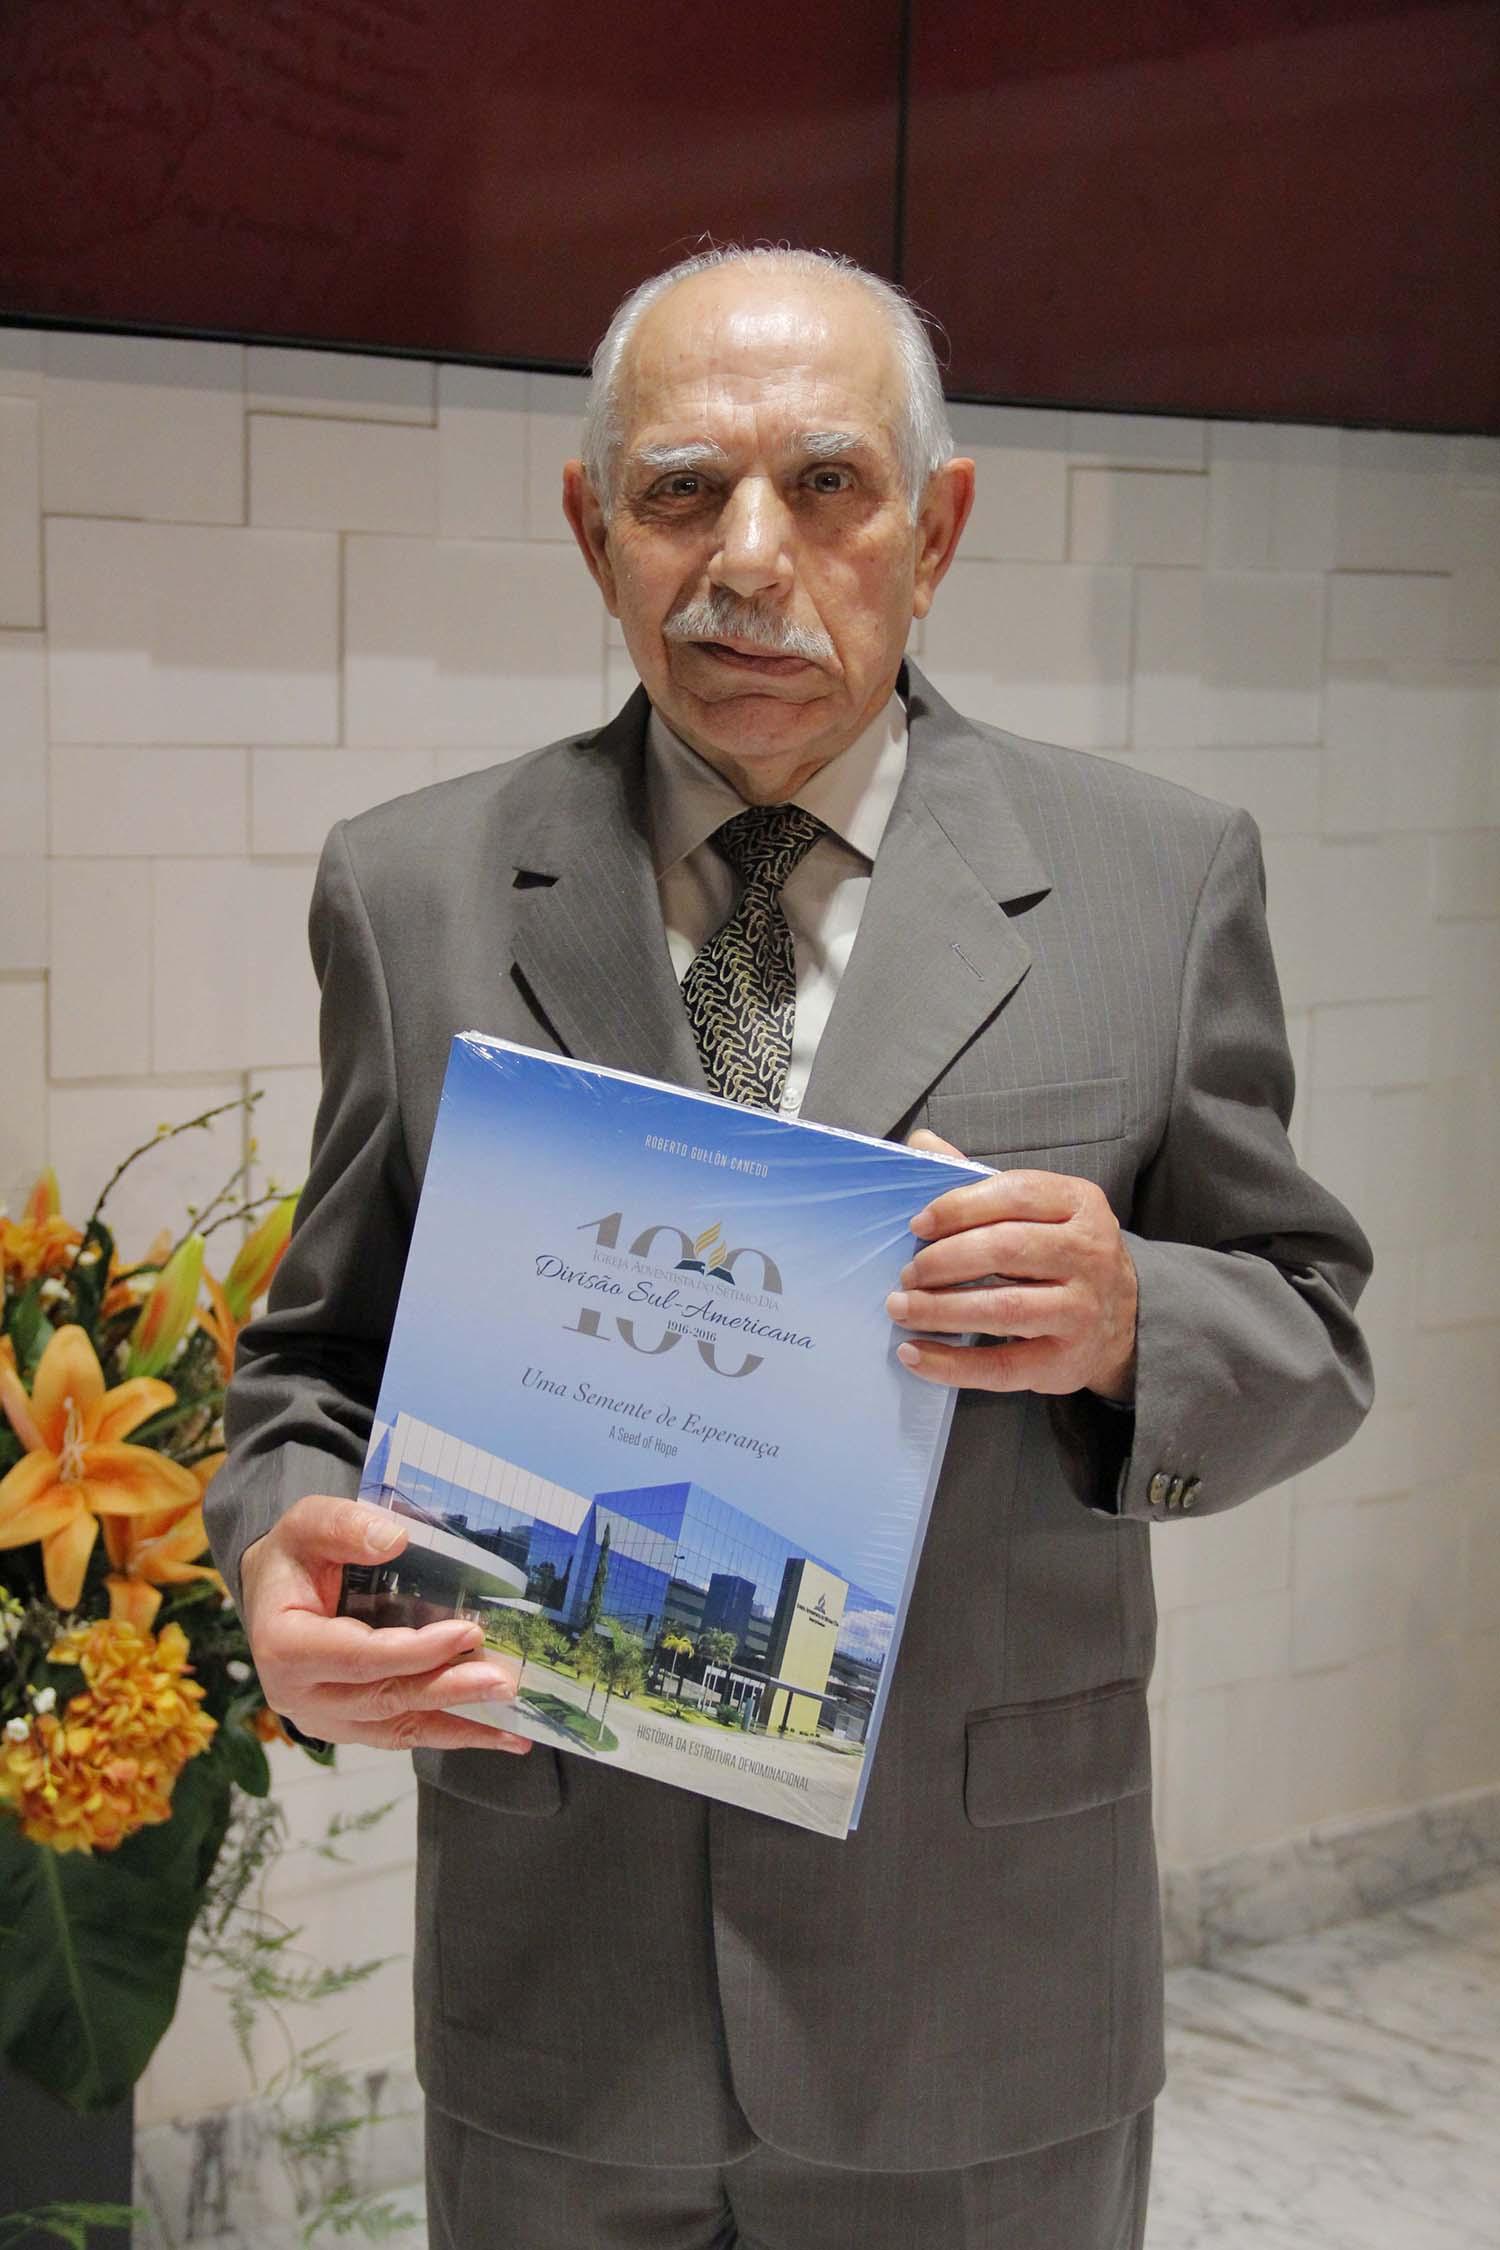 Sede-sul-americana-adventista-completa-100-anos11